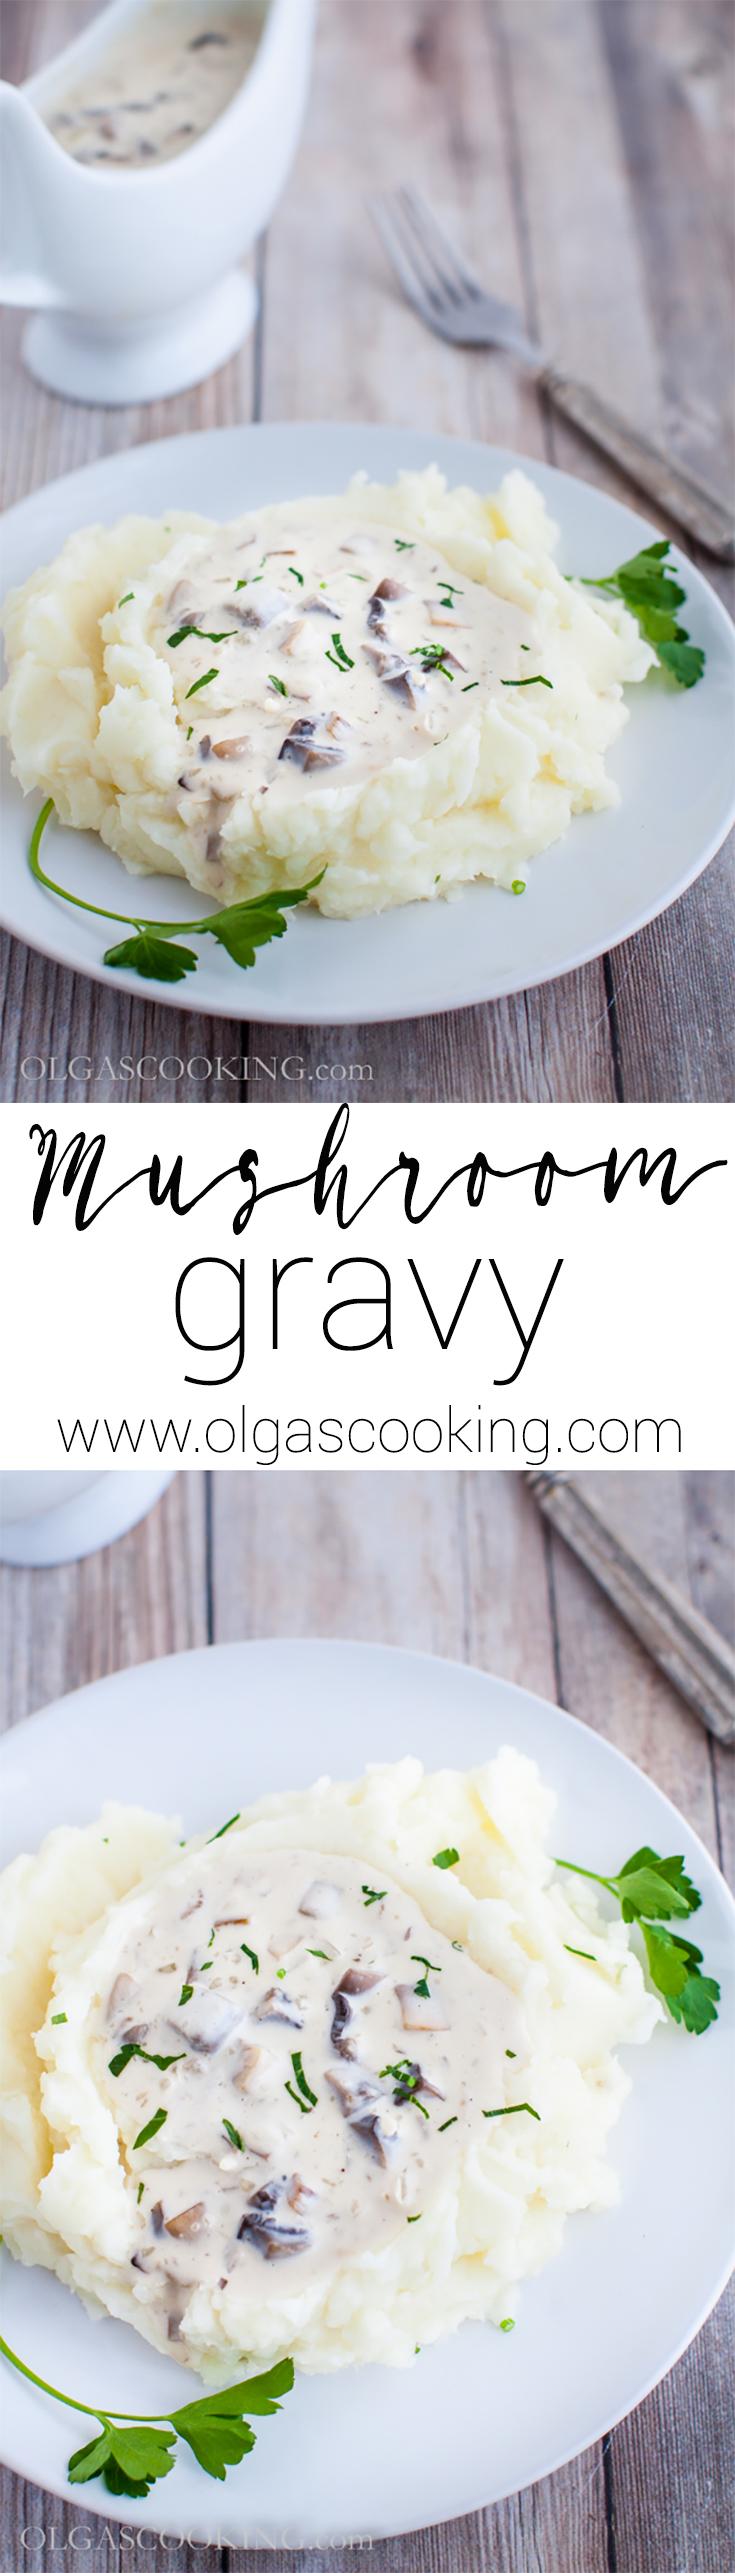 Easy mushroom gravy from scratch